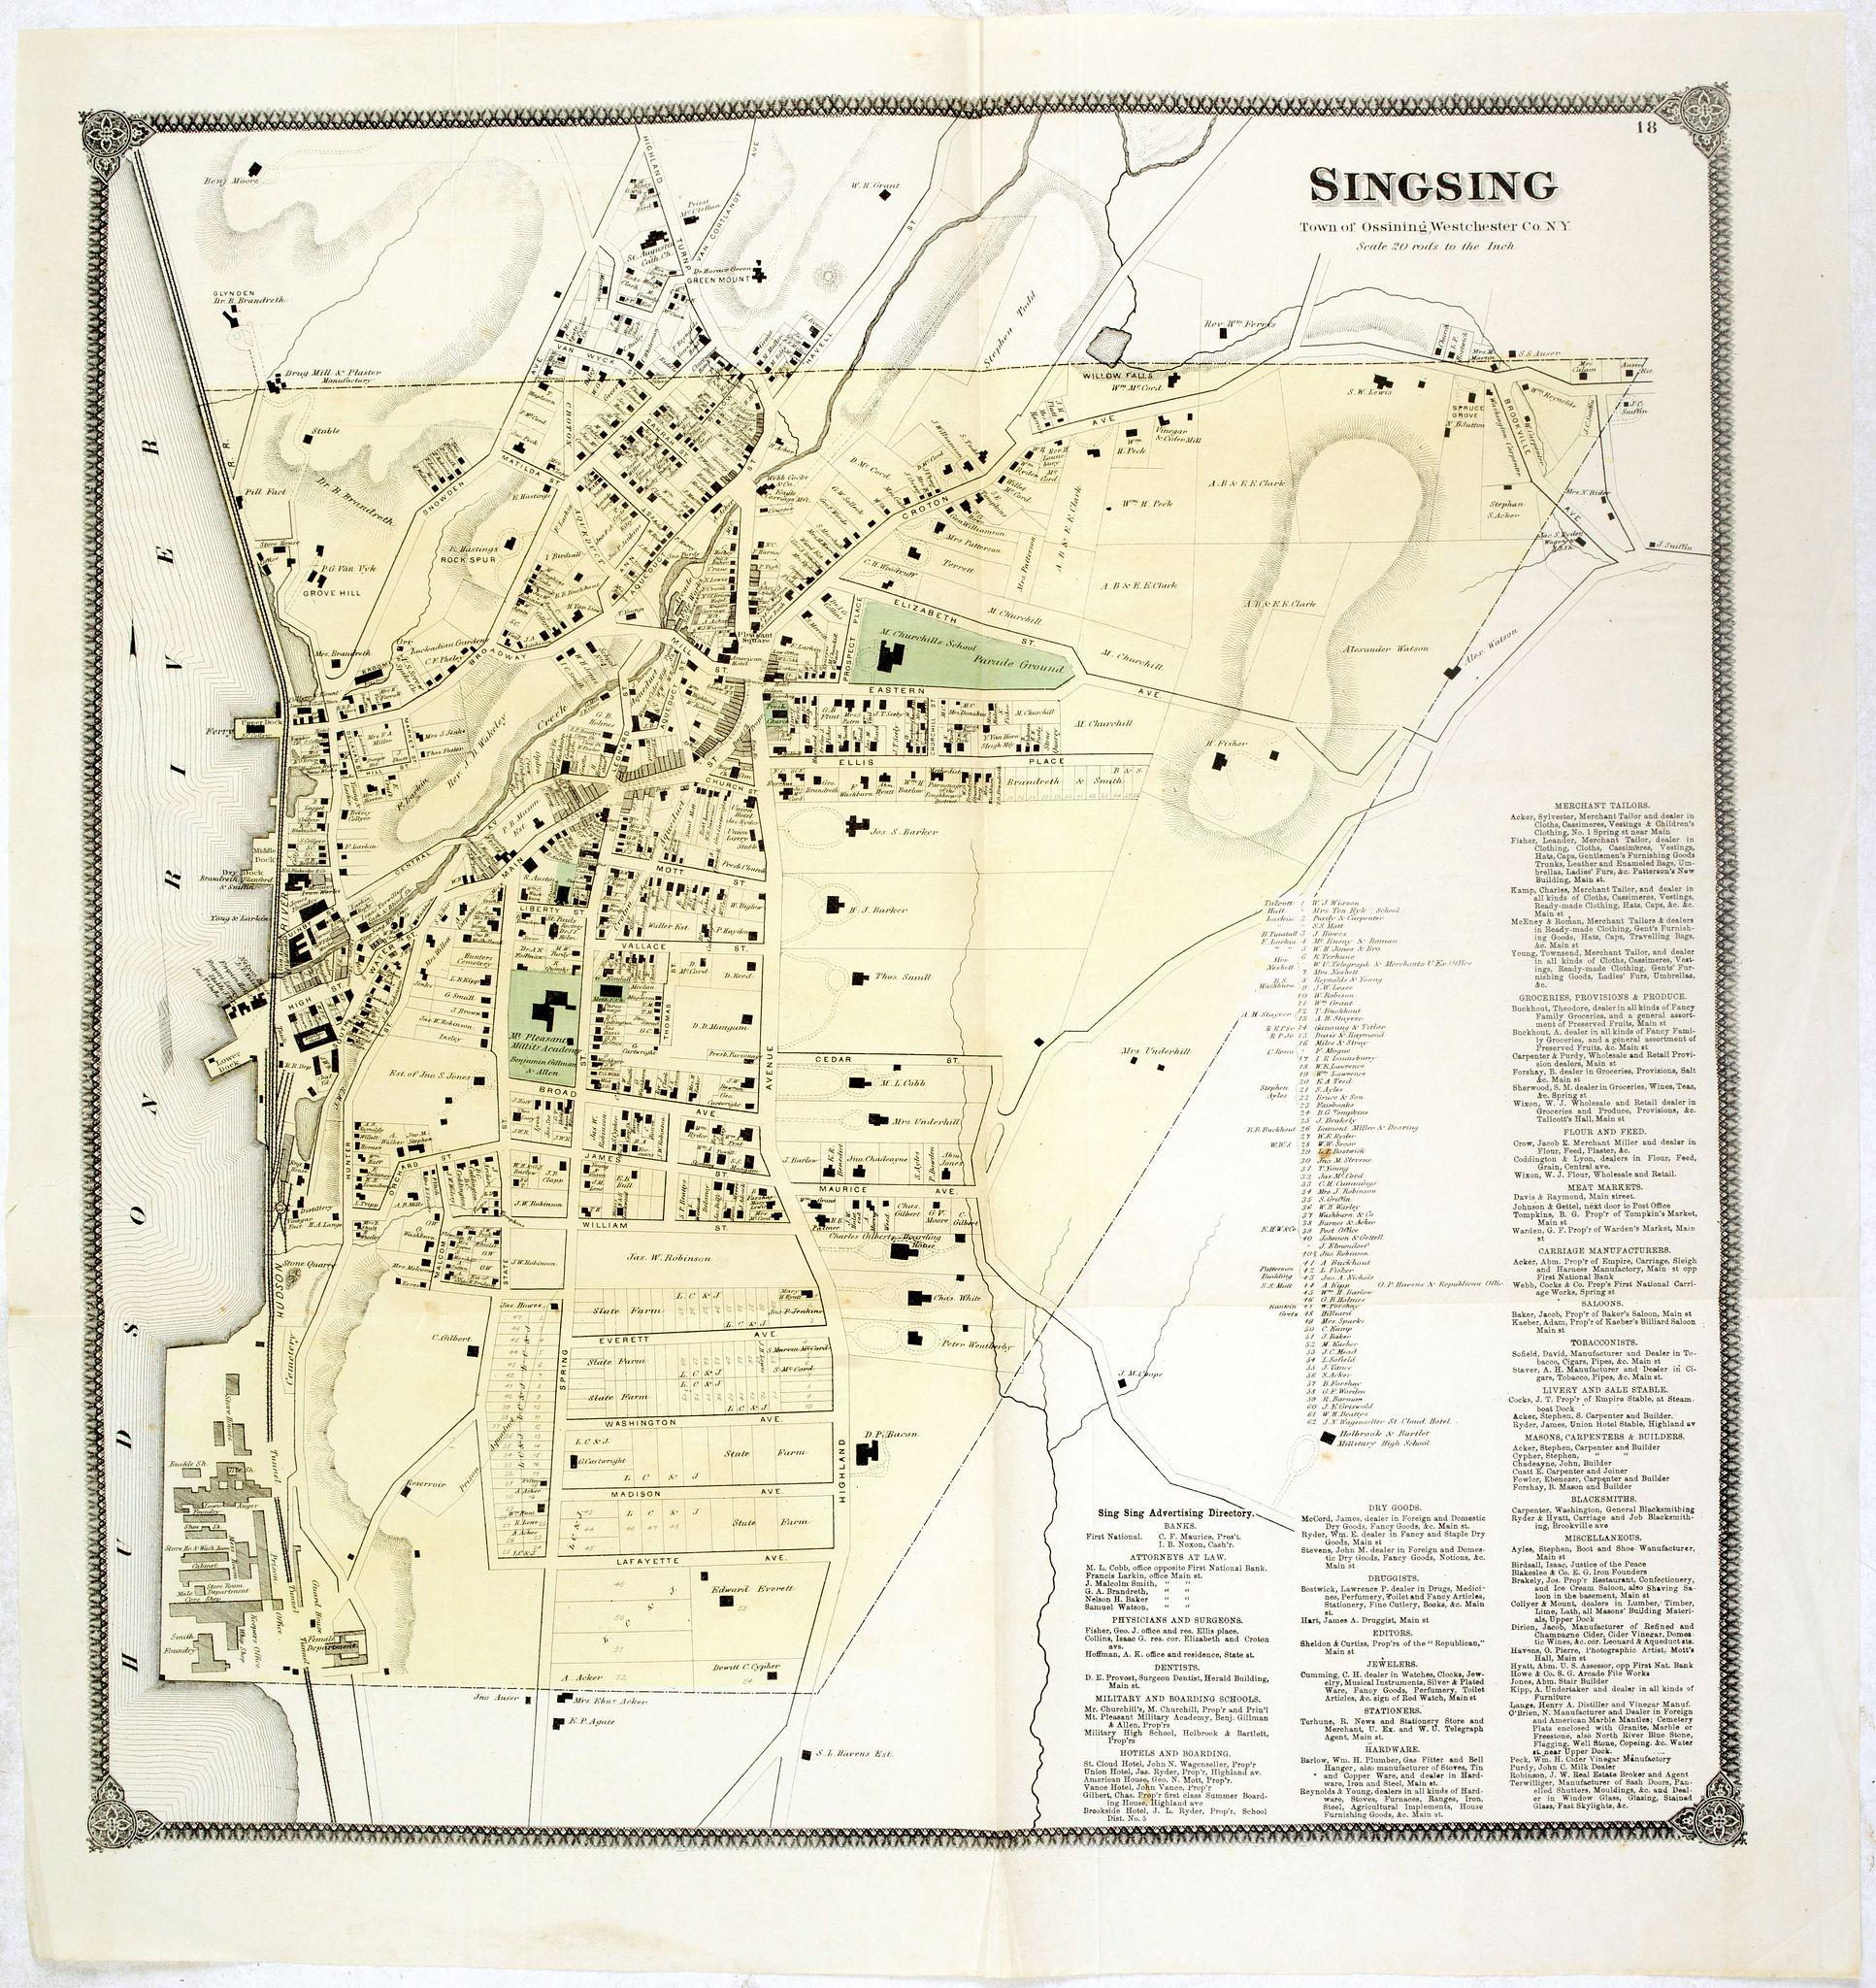 DE BEERS, F.W. -  Singsing Town of Ossining, Westchester Co. N.Y.